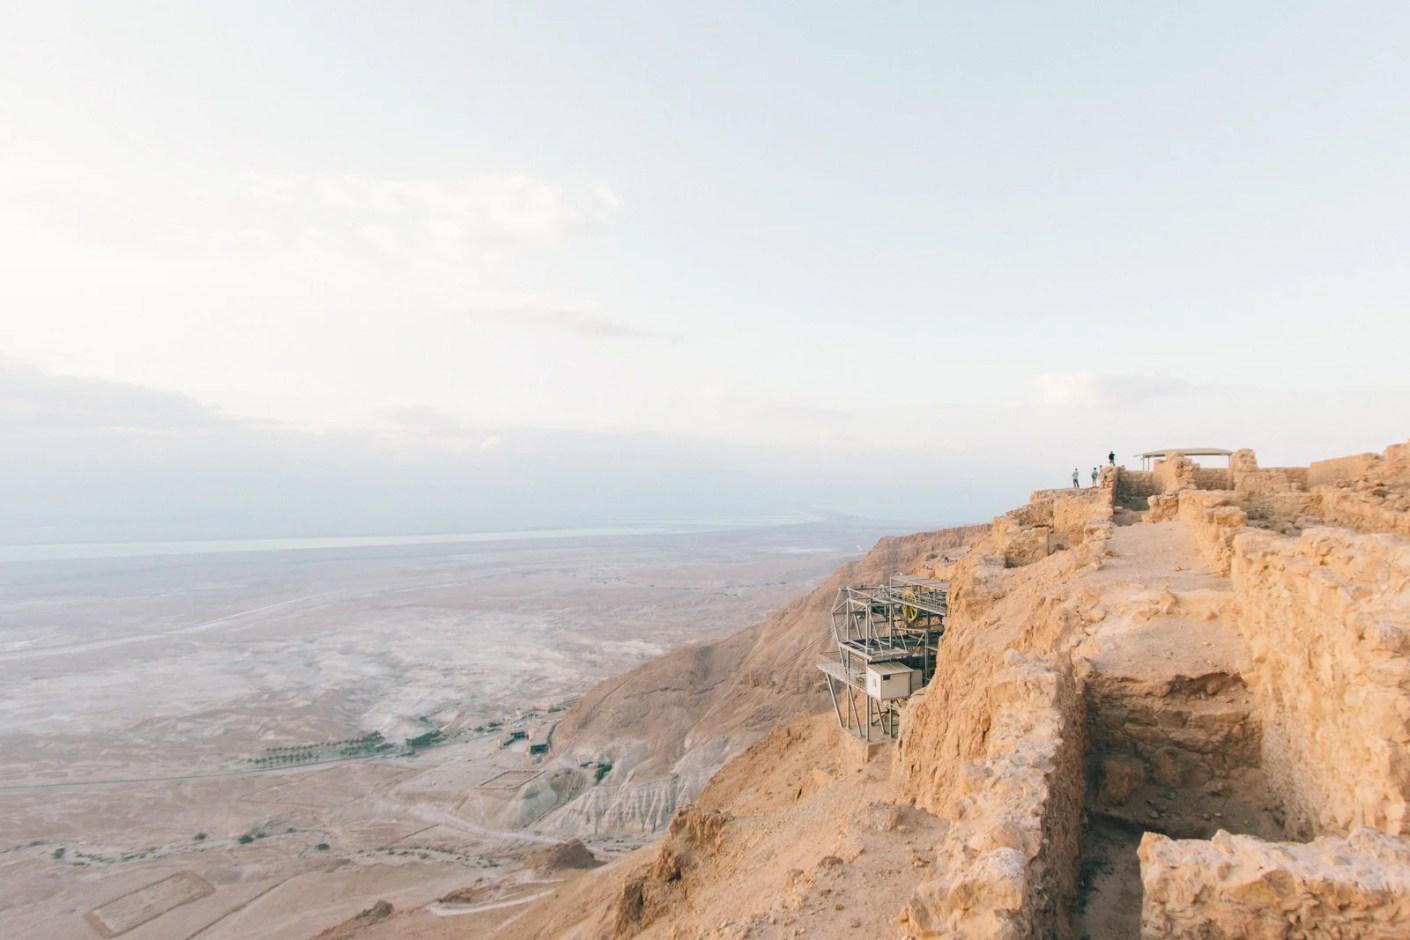 Masada National Park, Israel. (Photo by Robert Bye/Unsplash)